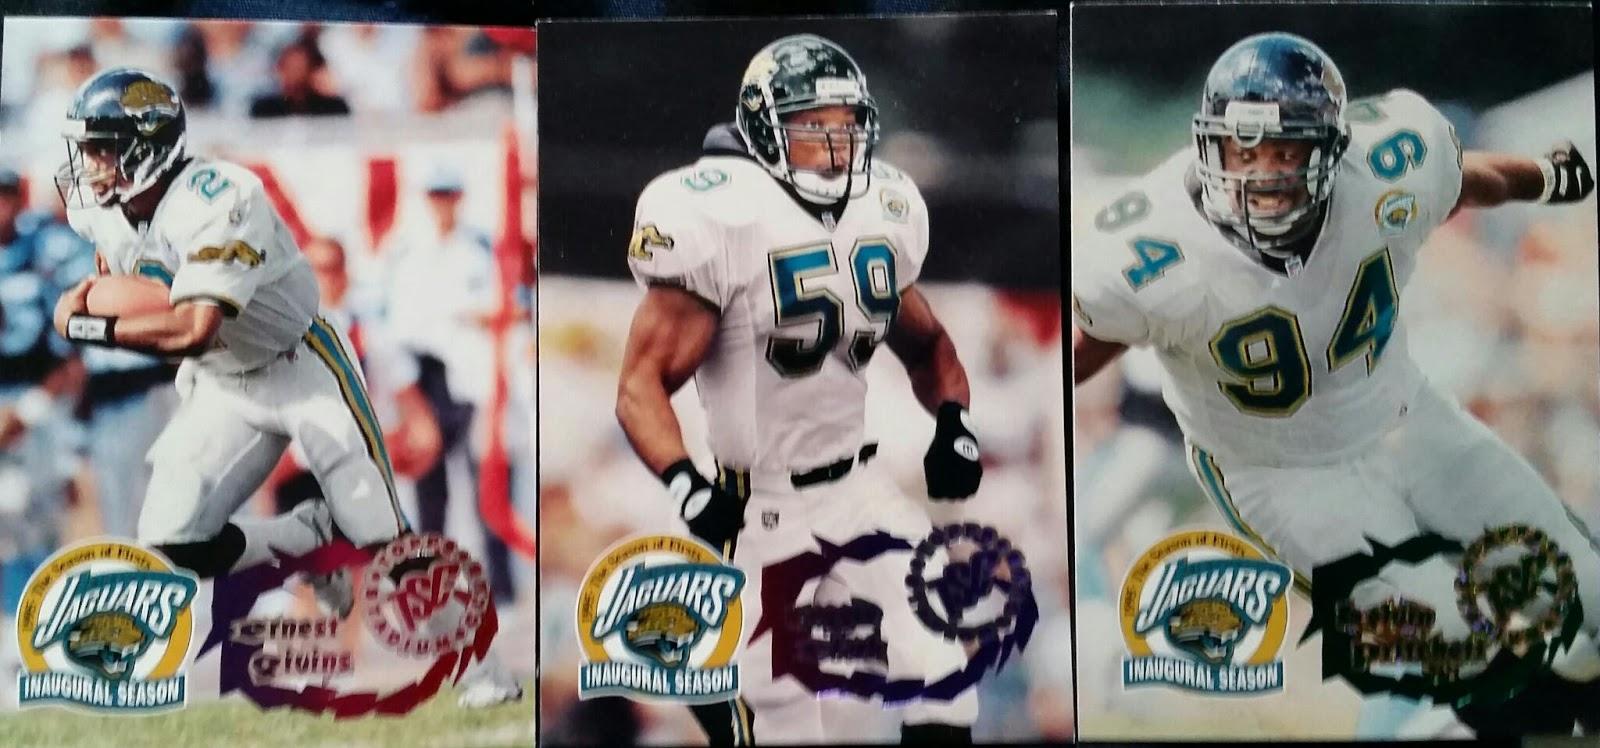 Sport Card Collectors Area 40 Has Even More